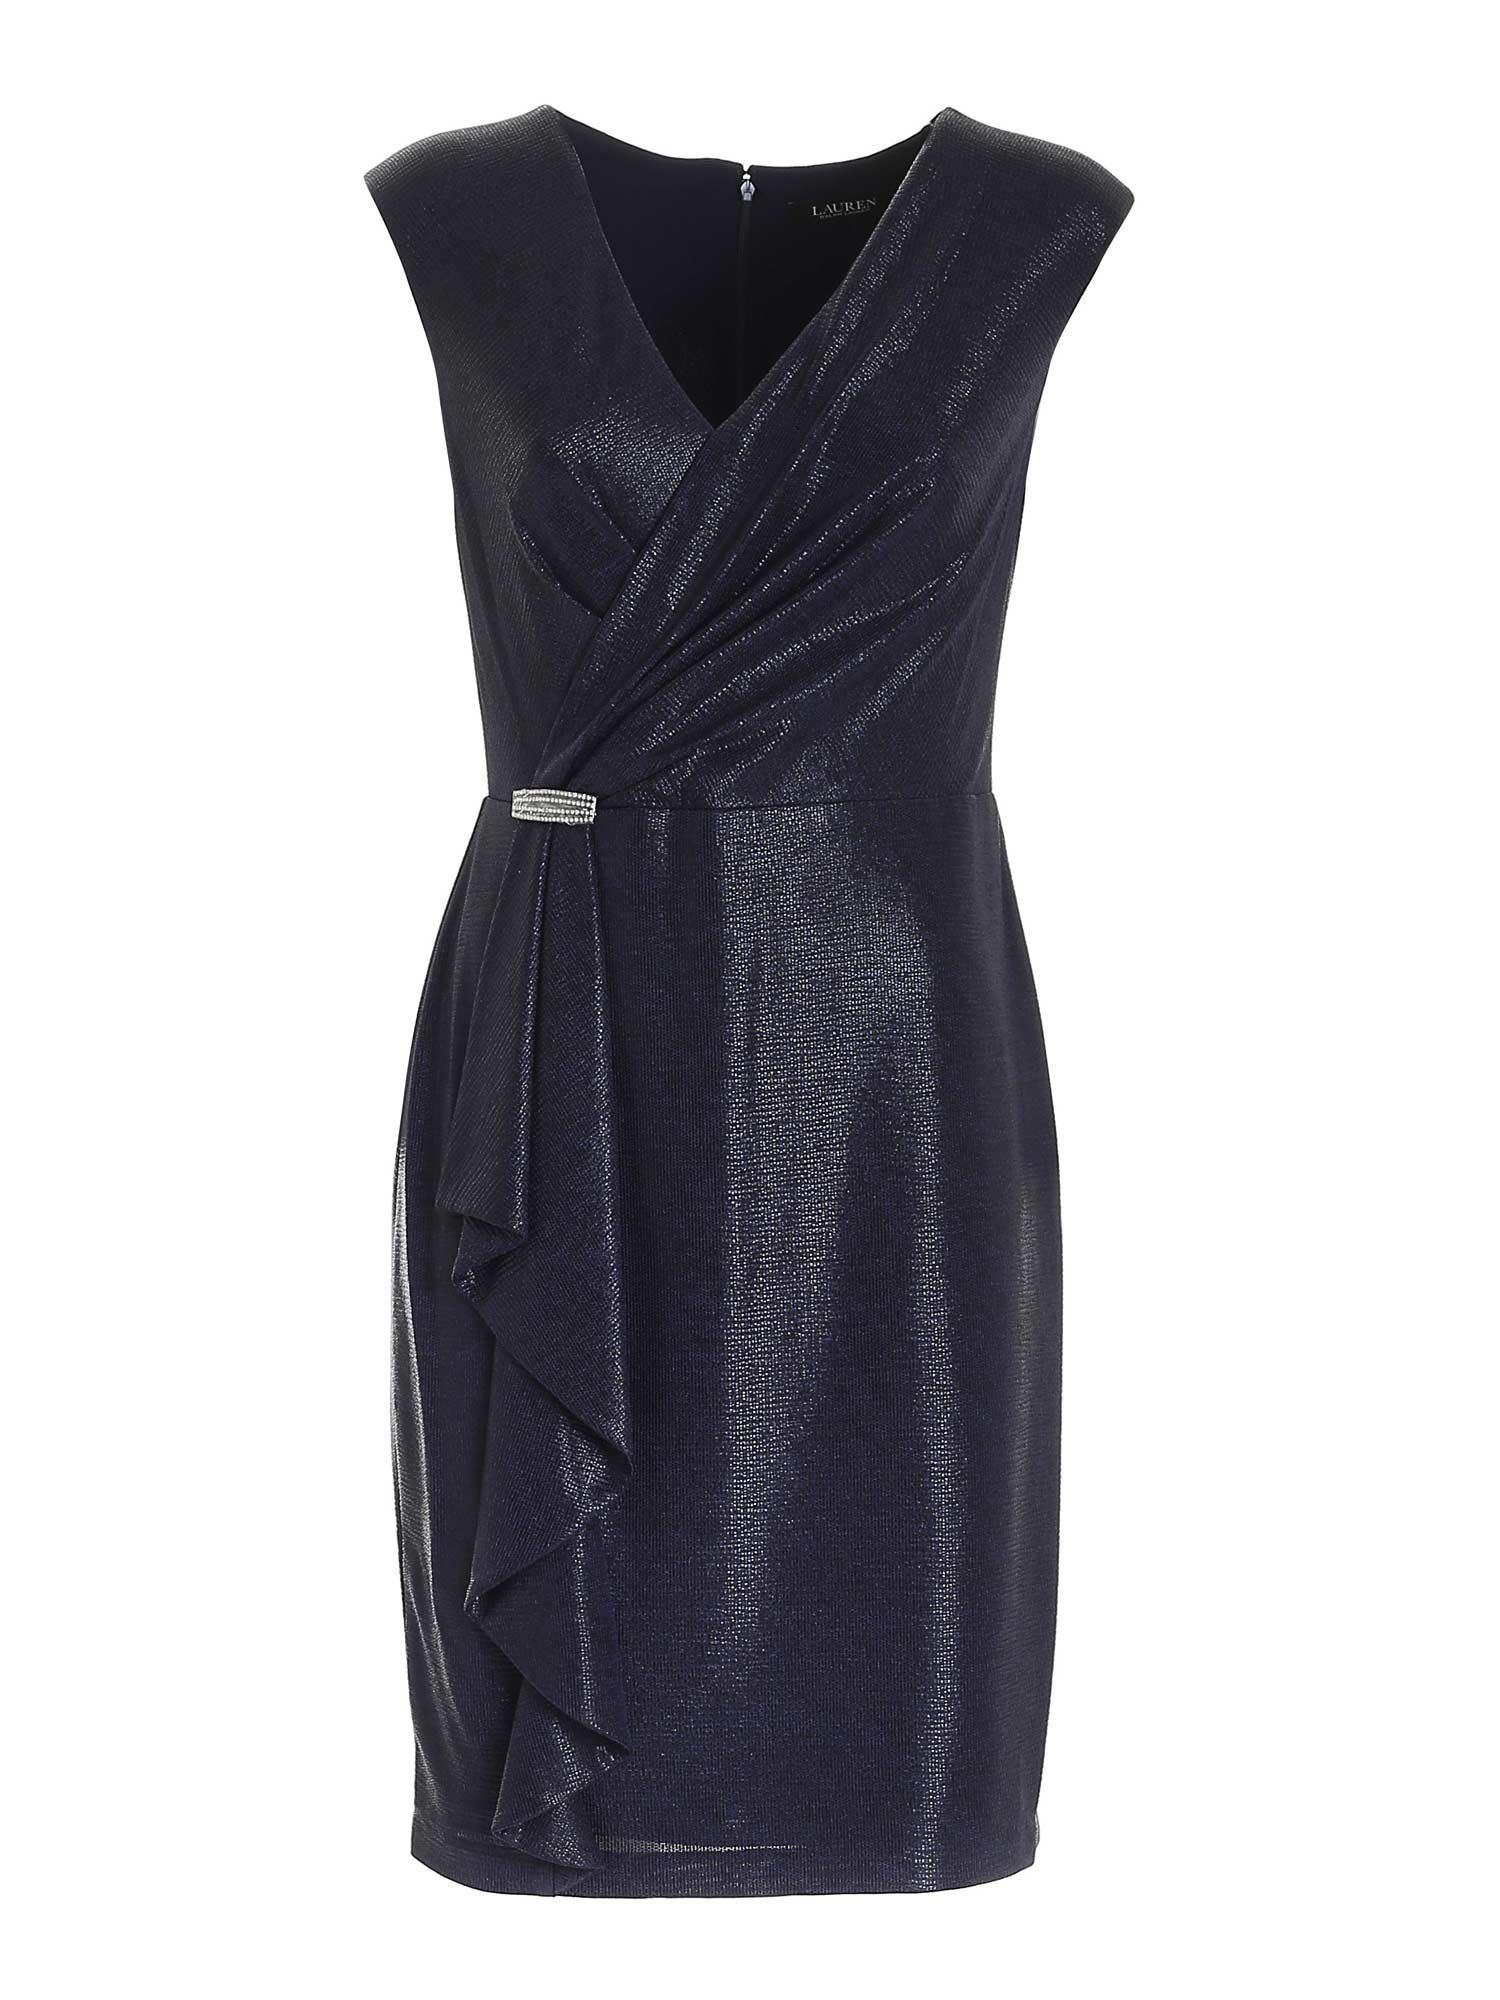 JEWEL DETAIL DRESS IN BLUE POLO RALPH LAUREN   11   253832600002